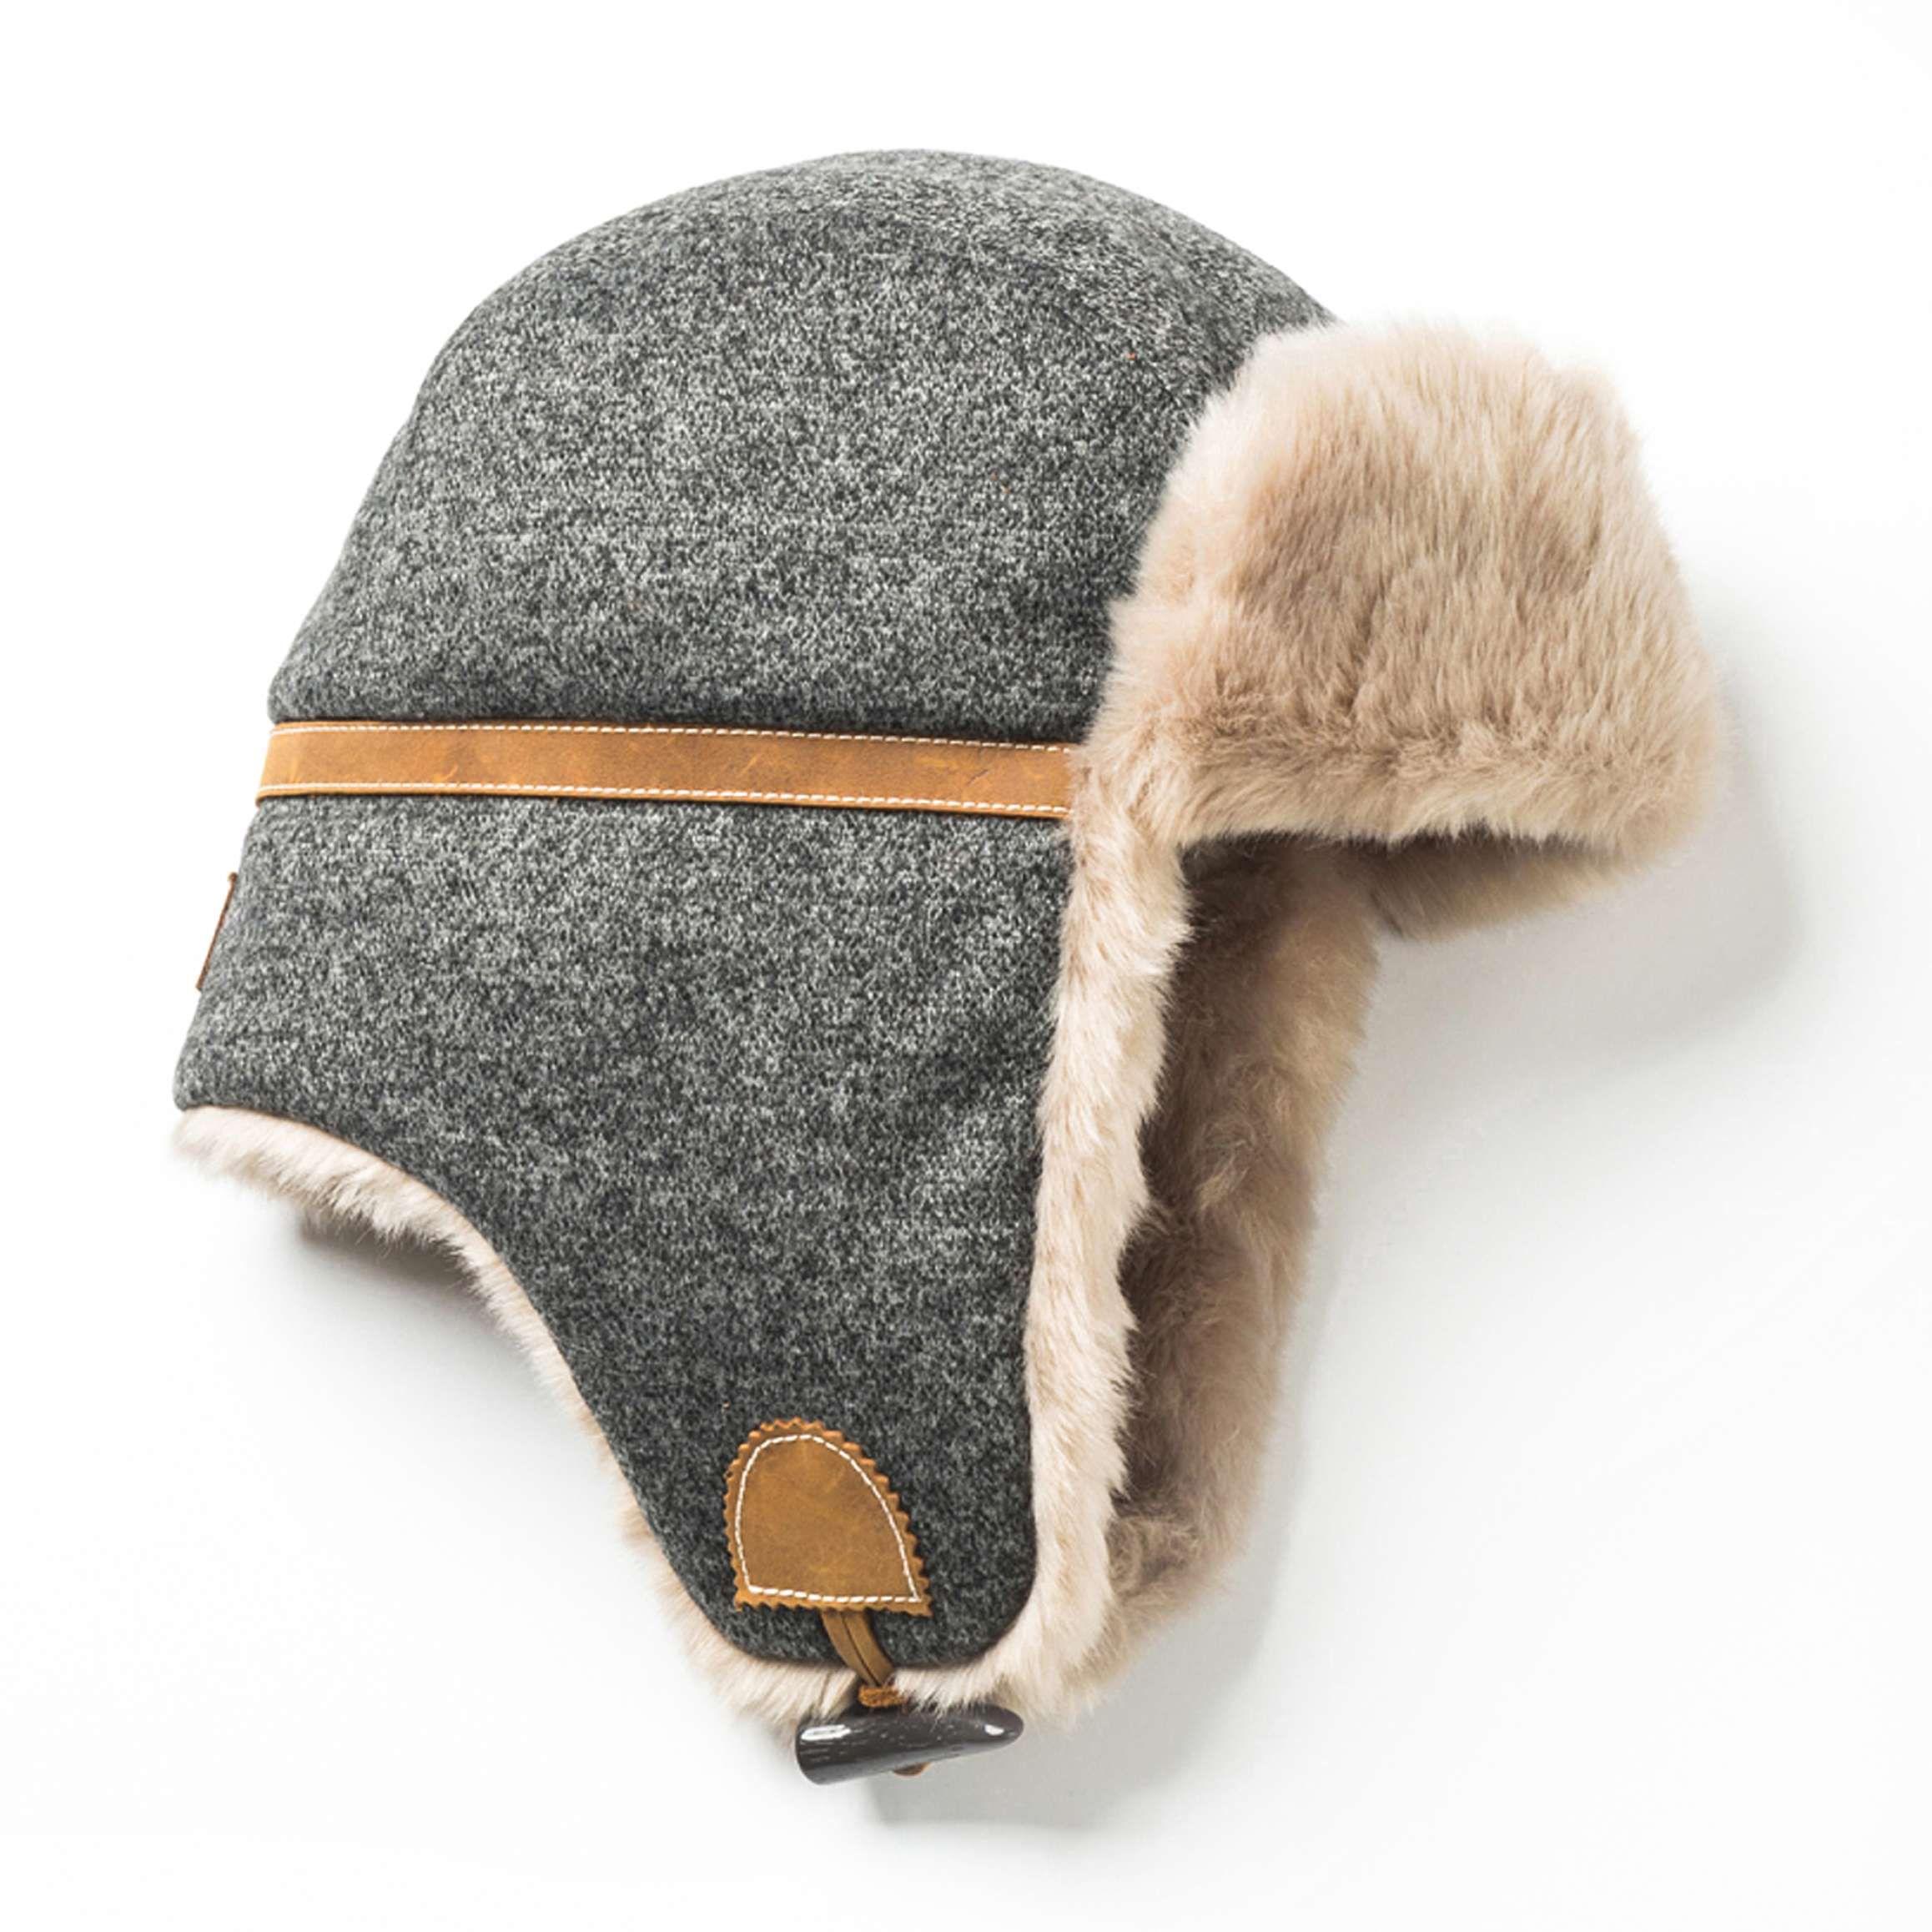 51f74b04095a9 Accessories Mens Harding Trapper Hat